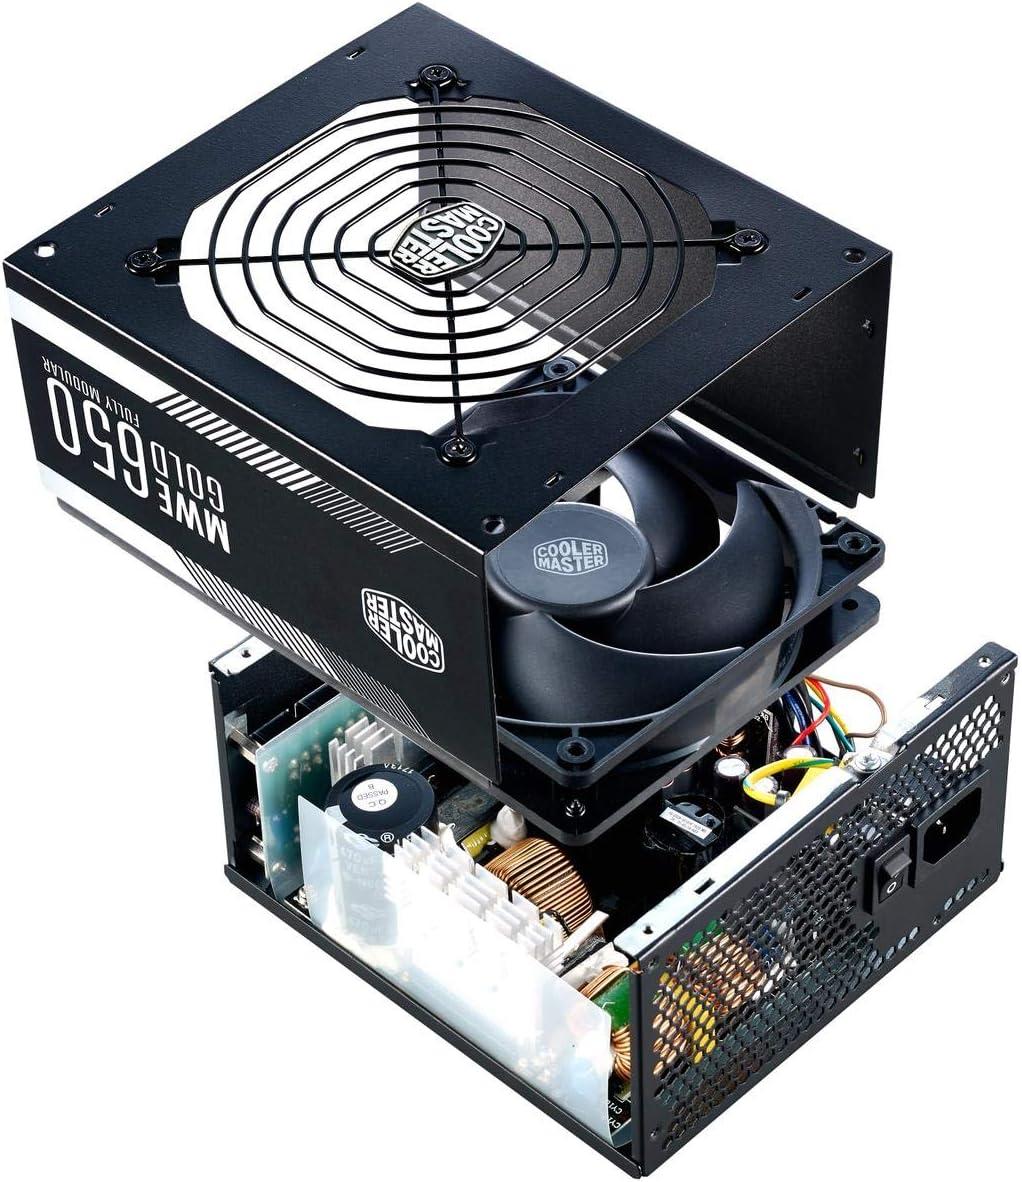 Flat Black Cables Single +12V Rail MPE-4501-ACAAW-US Cooler Master MWE 450 White 450W 80+ White PSU w// Hydro-Dynamic-Bearing Silent 120mm Fan